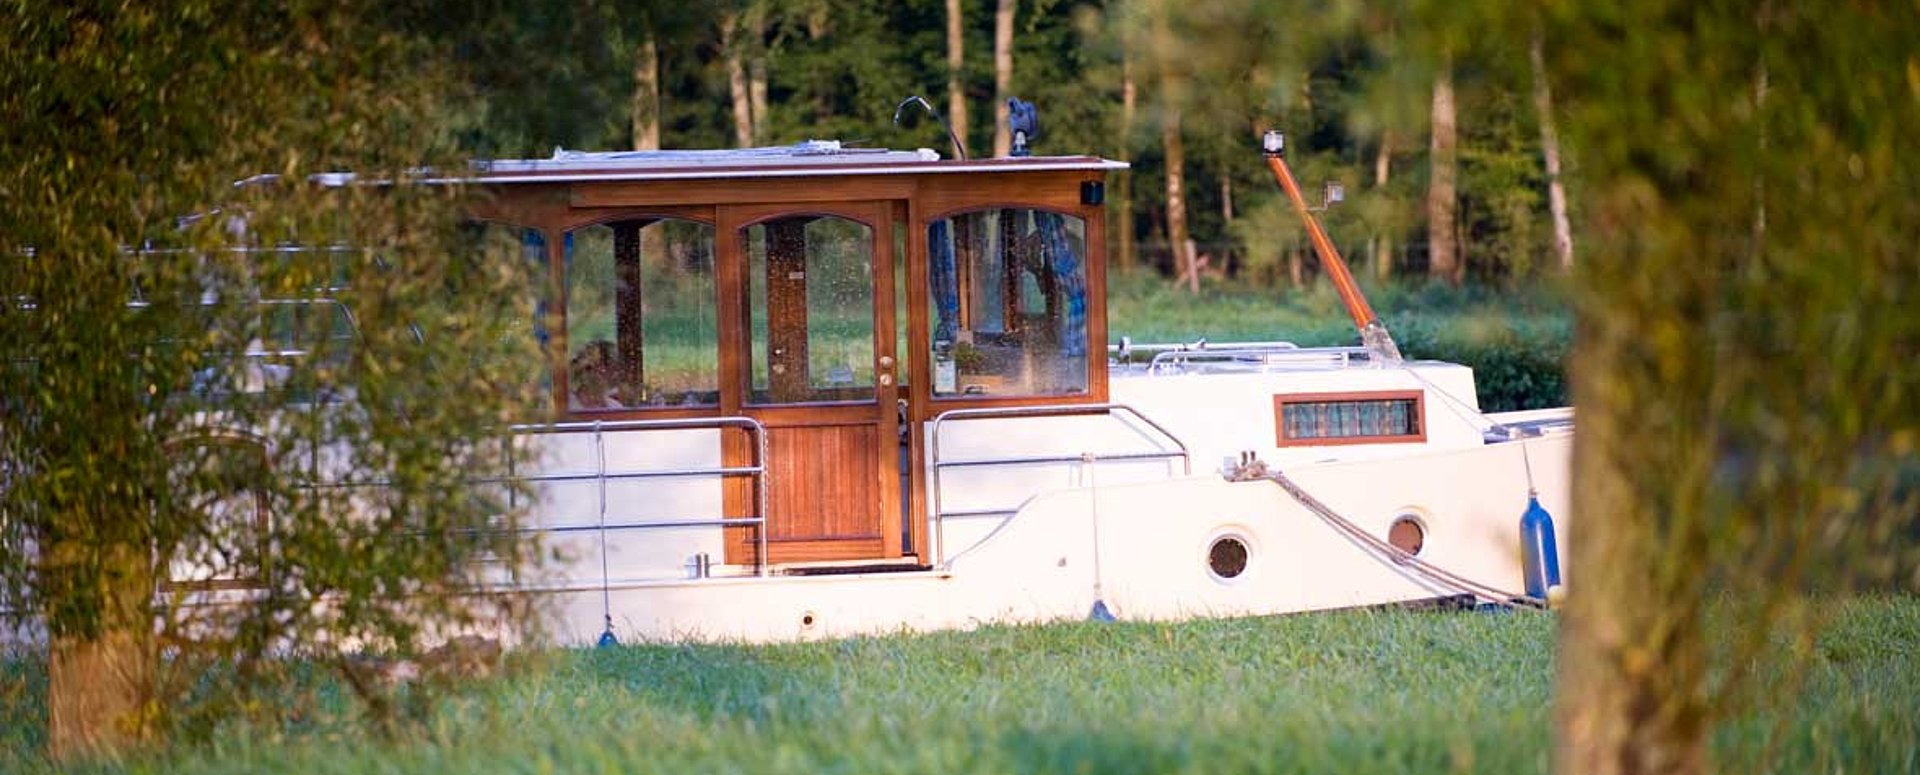 unser hausboot kormoran 1290 mit drei kabinen mein boot. Black Bedroom Furniture Sets. Home Design Ideas